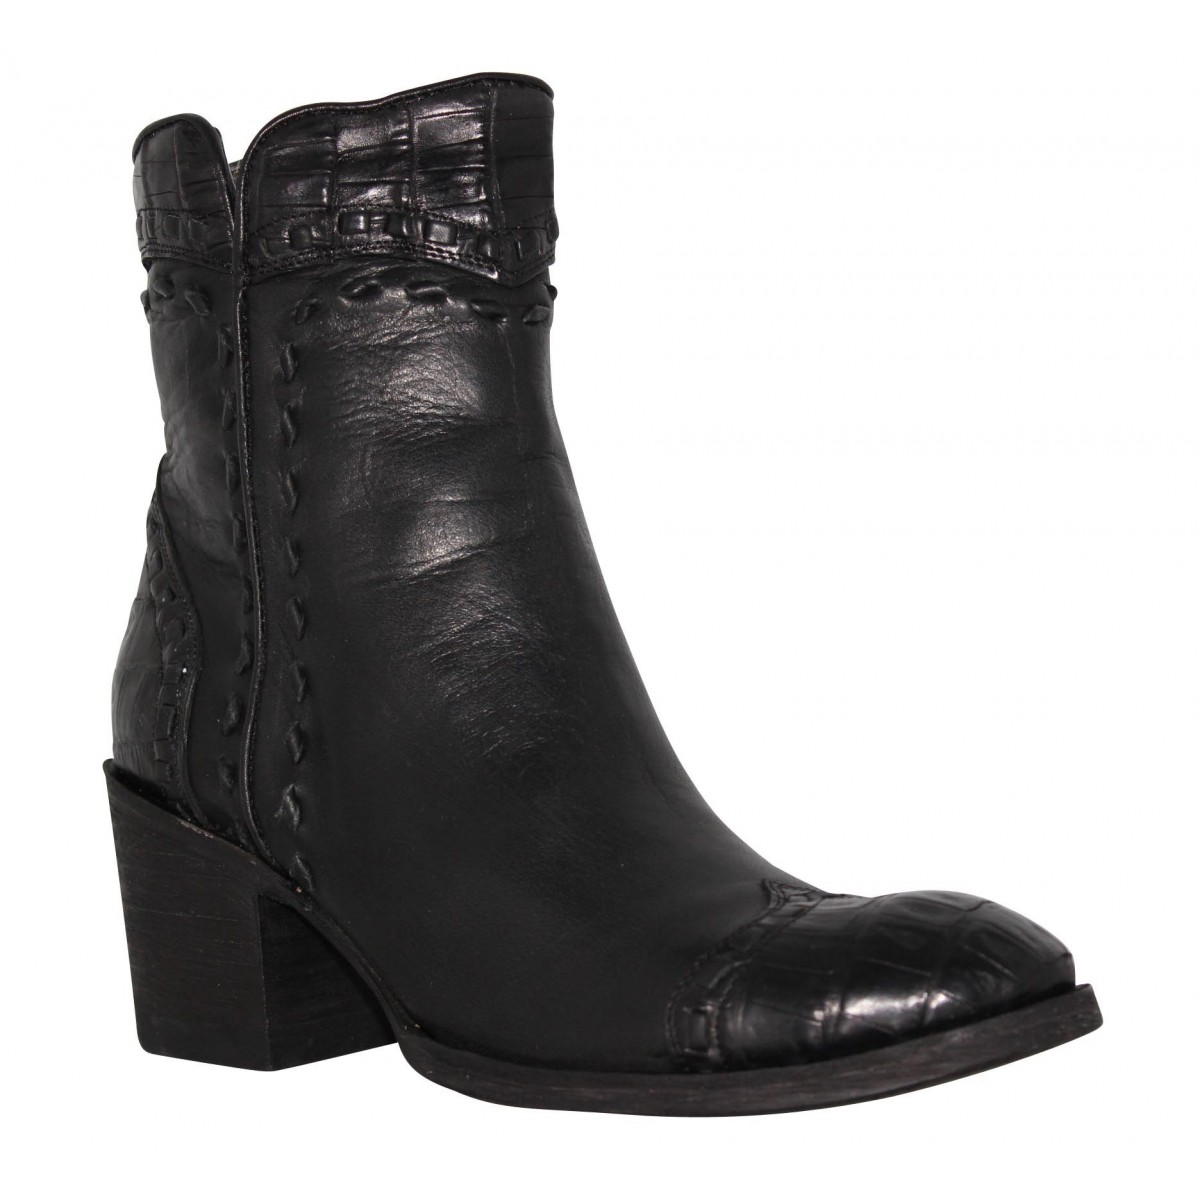 Bottines MEXICANA Crithier cuir + cayman Femme Noir